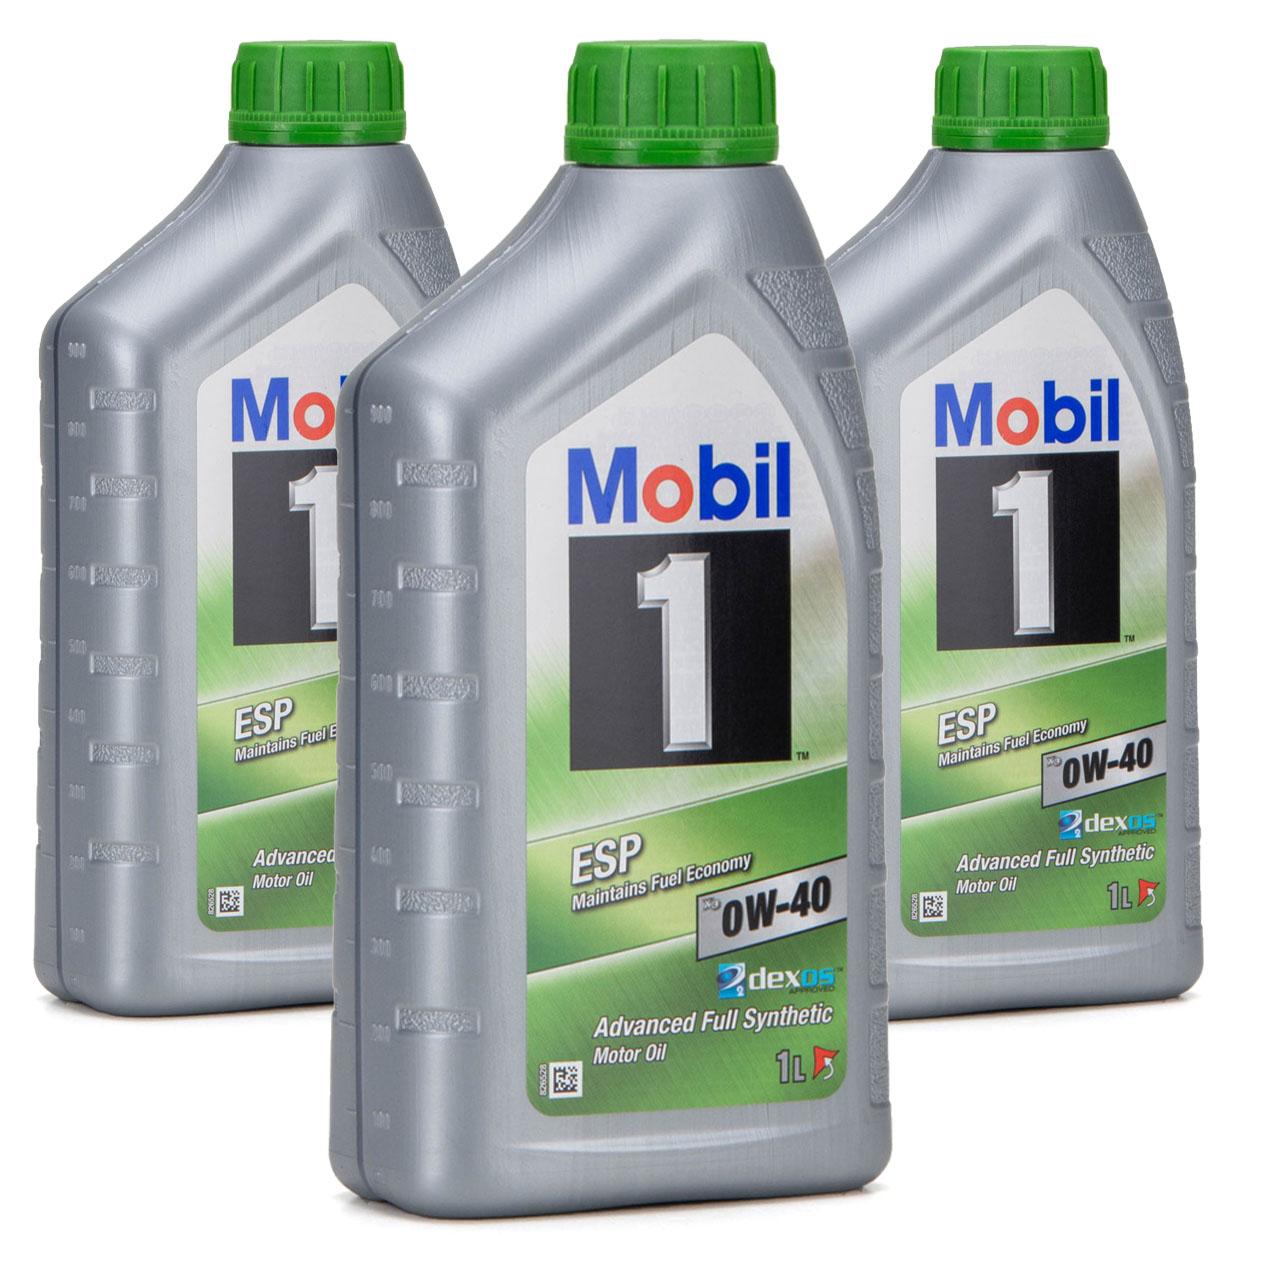 Mobil 1 ESP X3 C40 Motoröl Öl 0W-40 0W40 dexos2 PORSCHE C40 VW 511.00 - 3 Liter